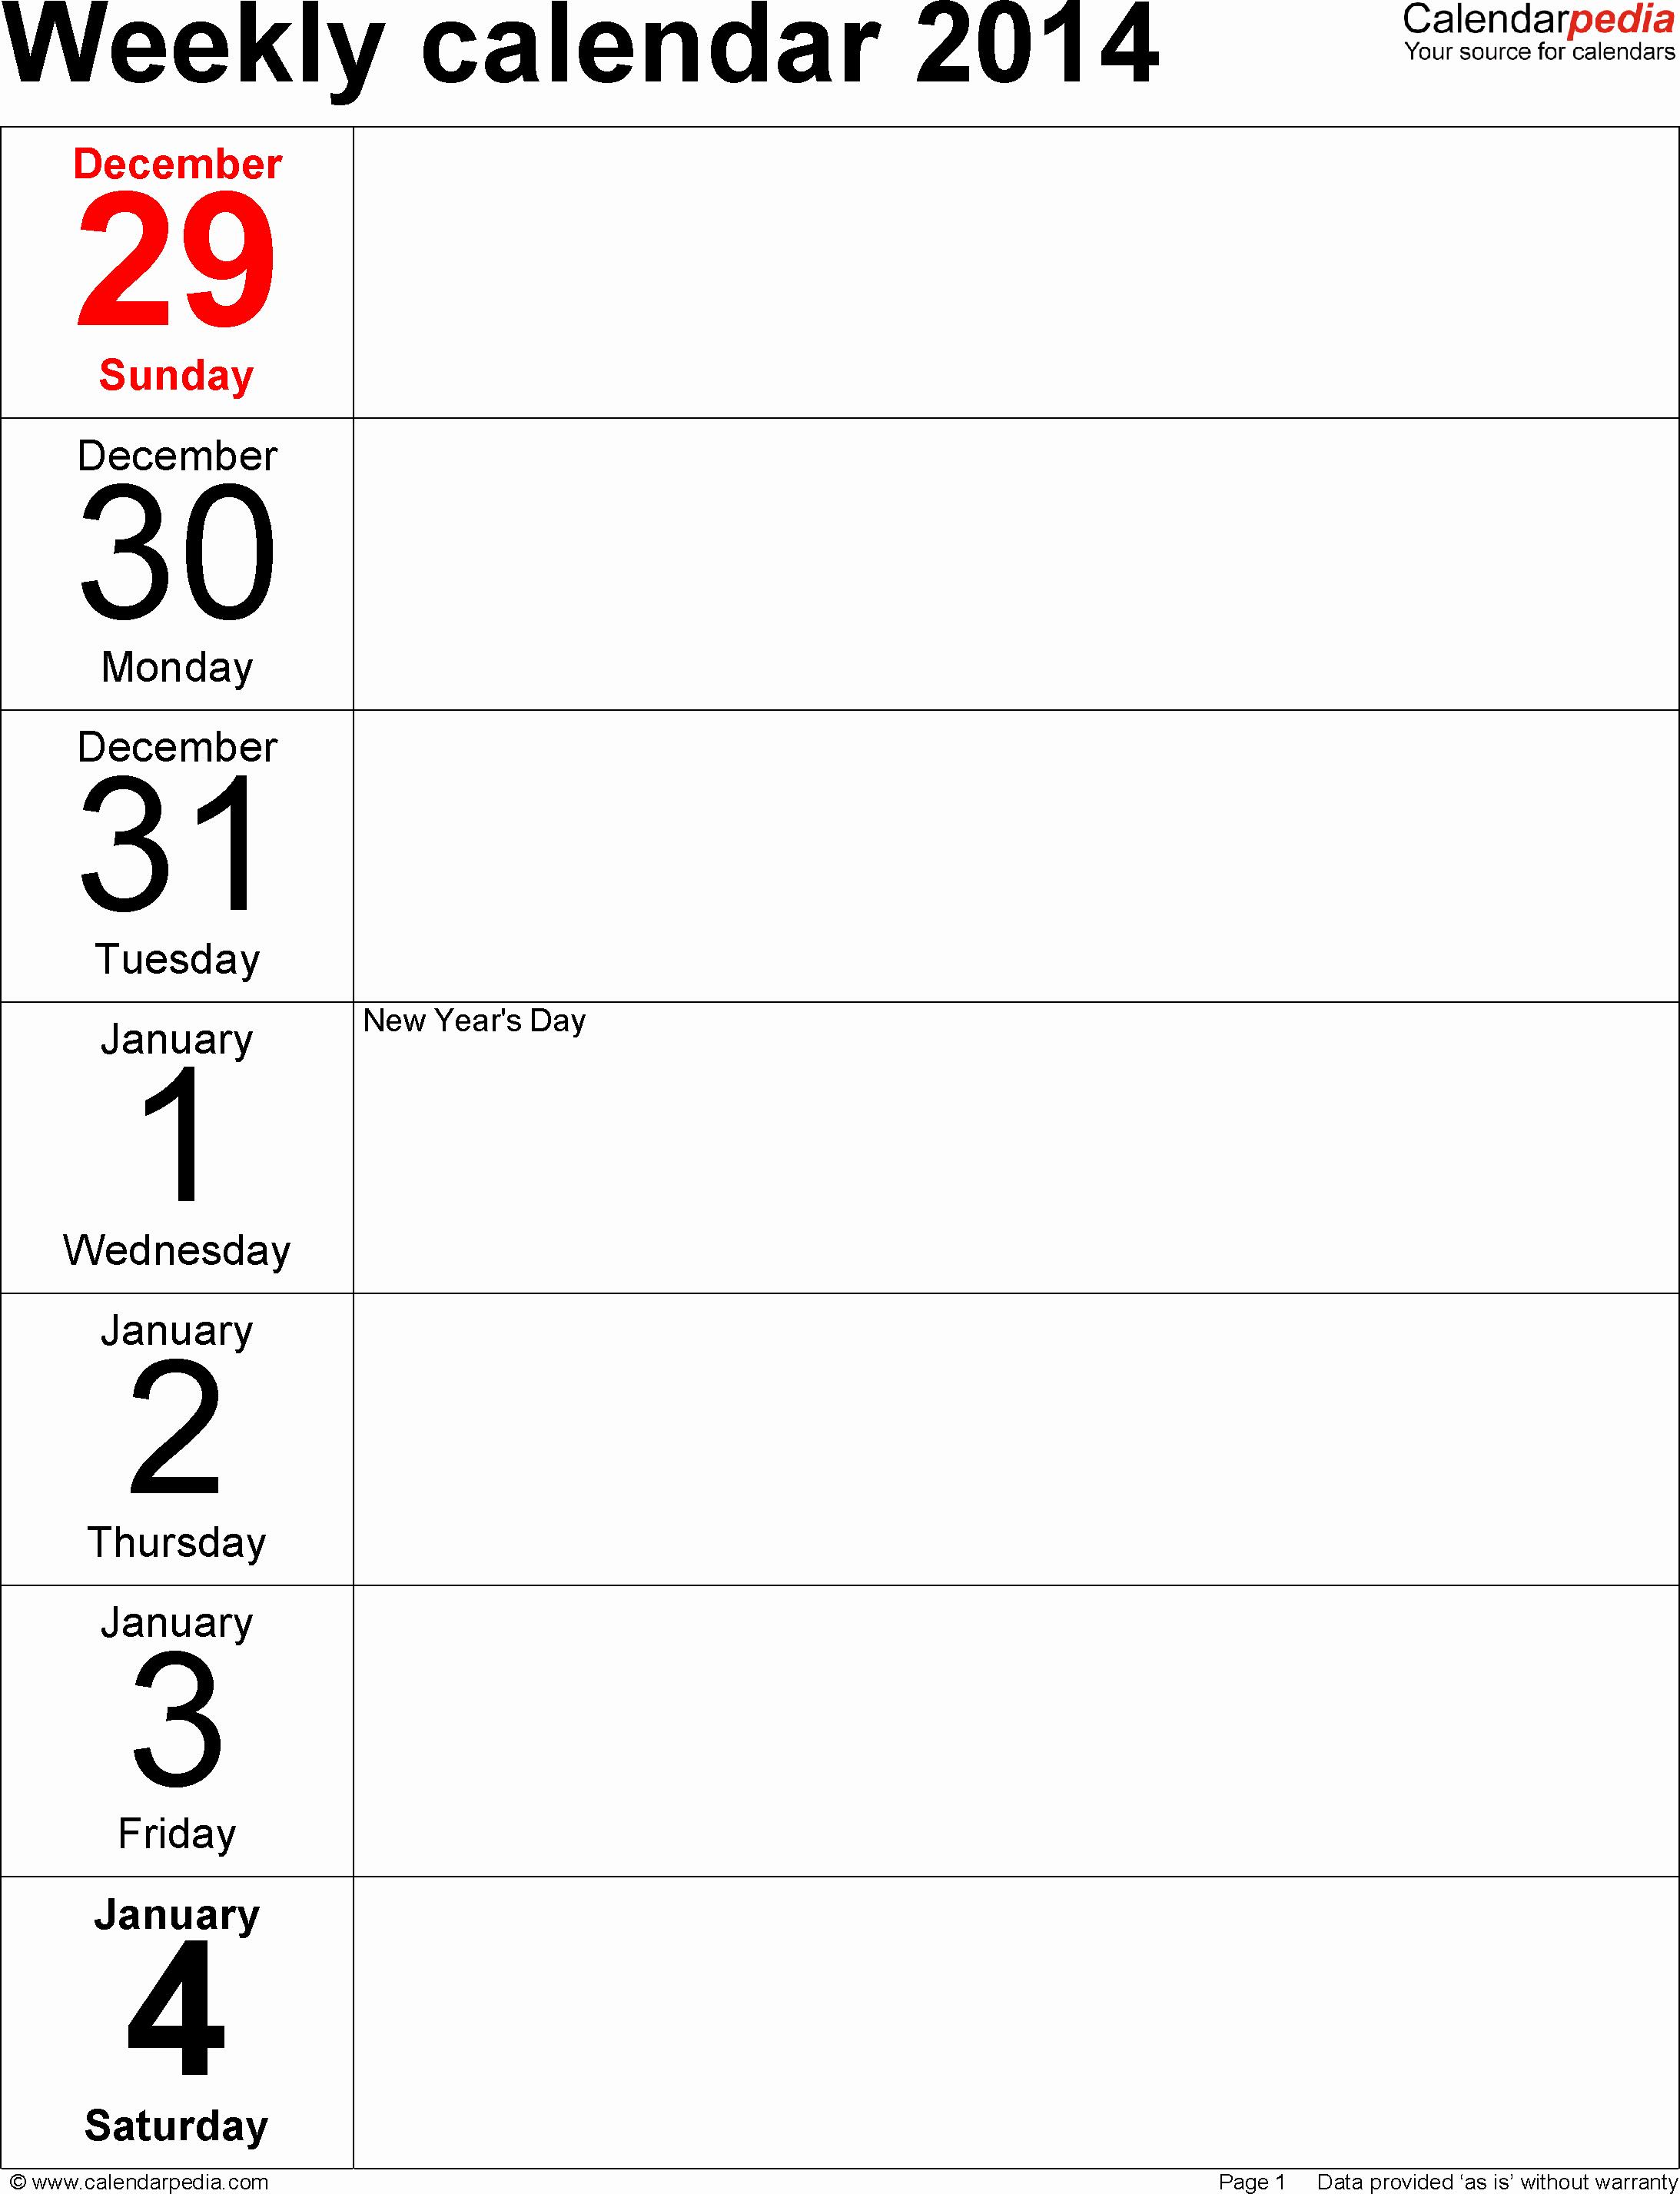 Microsoft Word Weekly Calendar Template Fresh Weekly Calendar 2014 for Word 4 Free Printable Templates